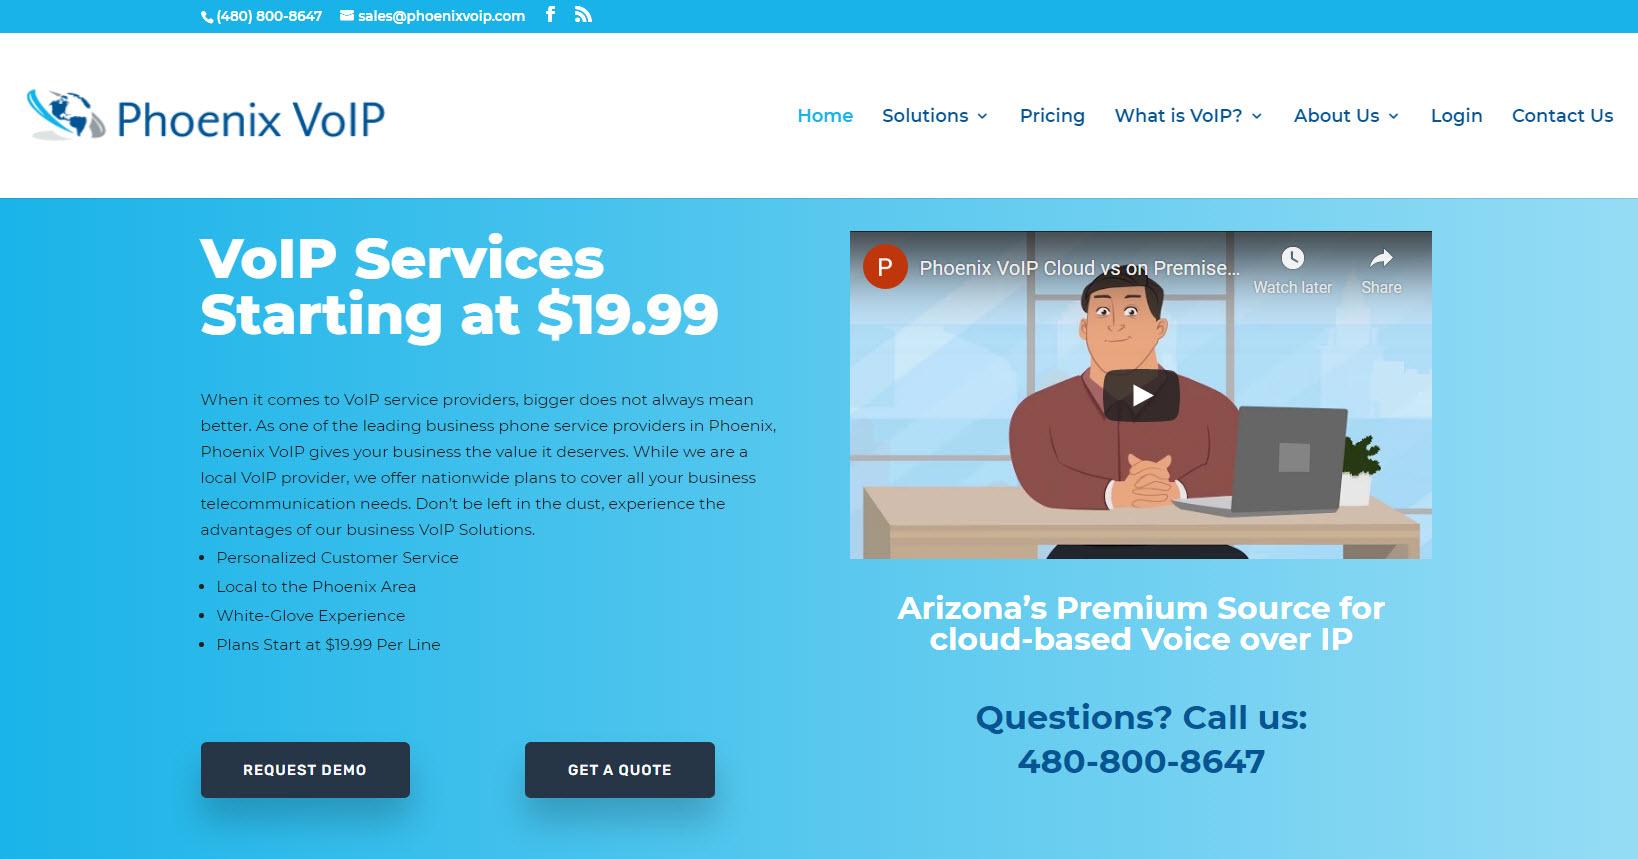 Phoenix VoIP, voice over internet protocol